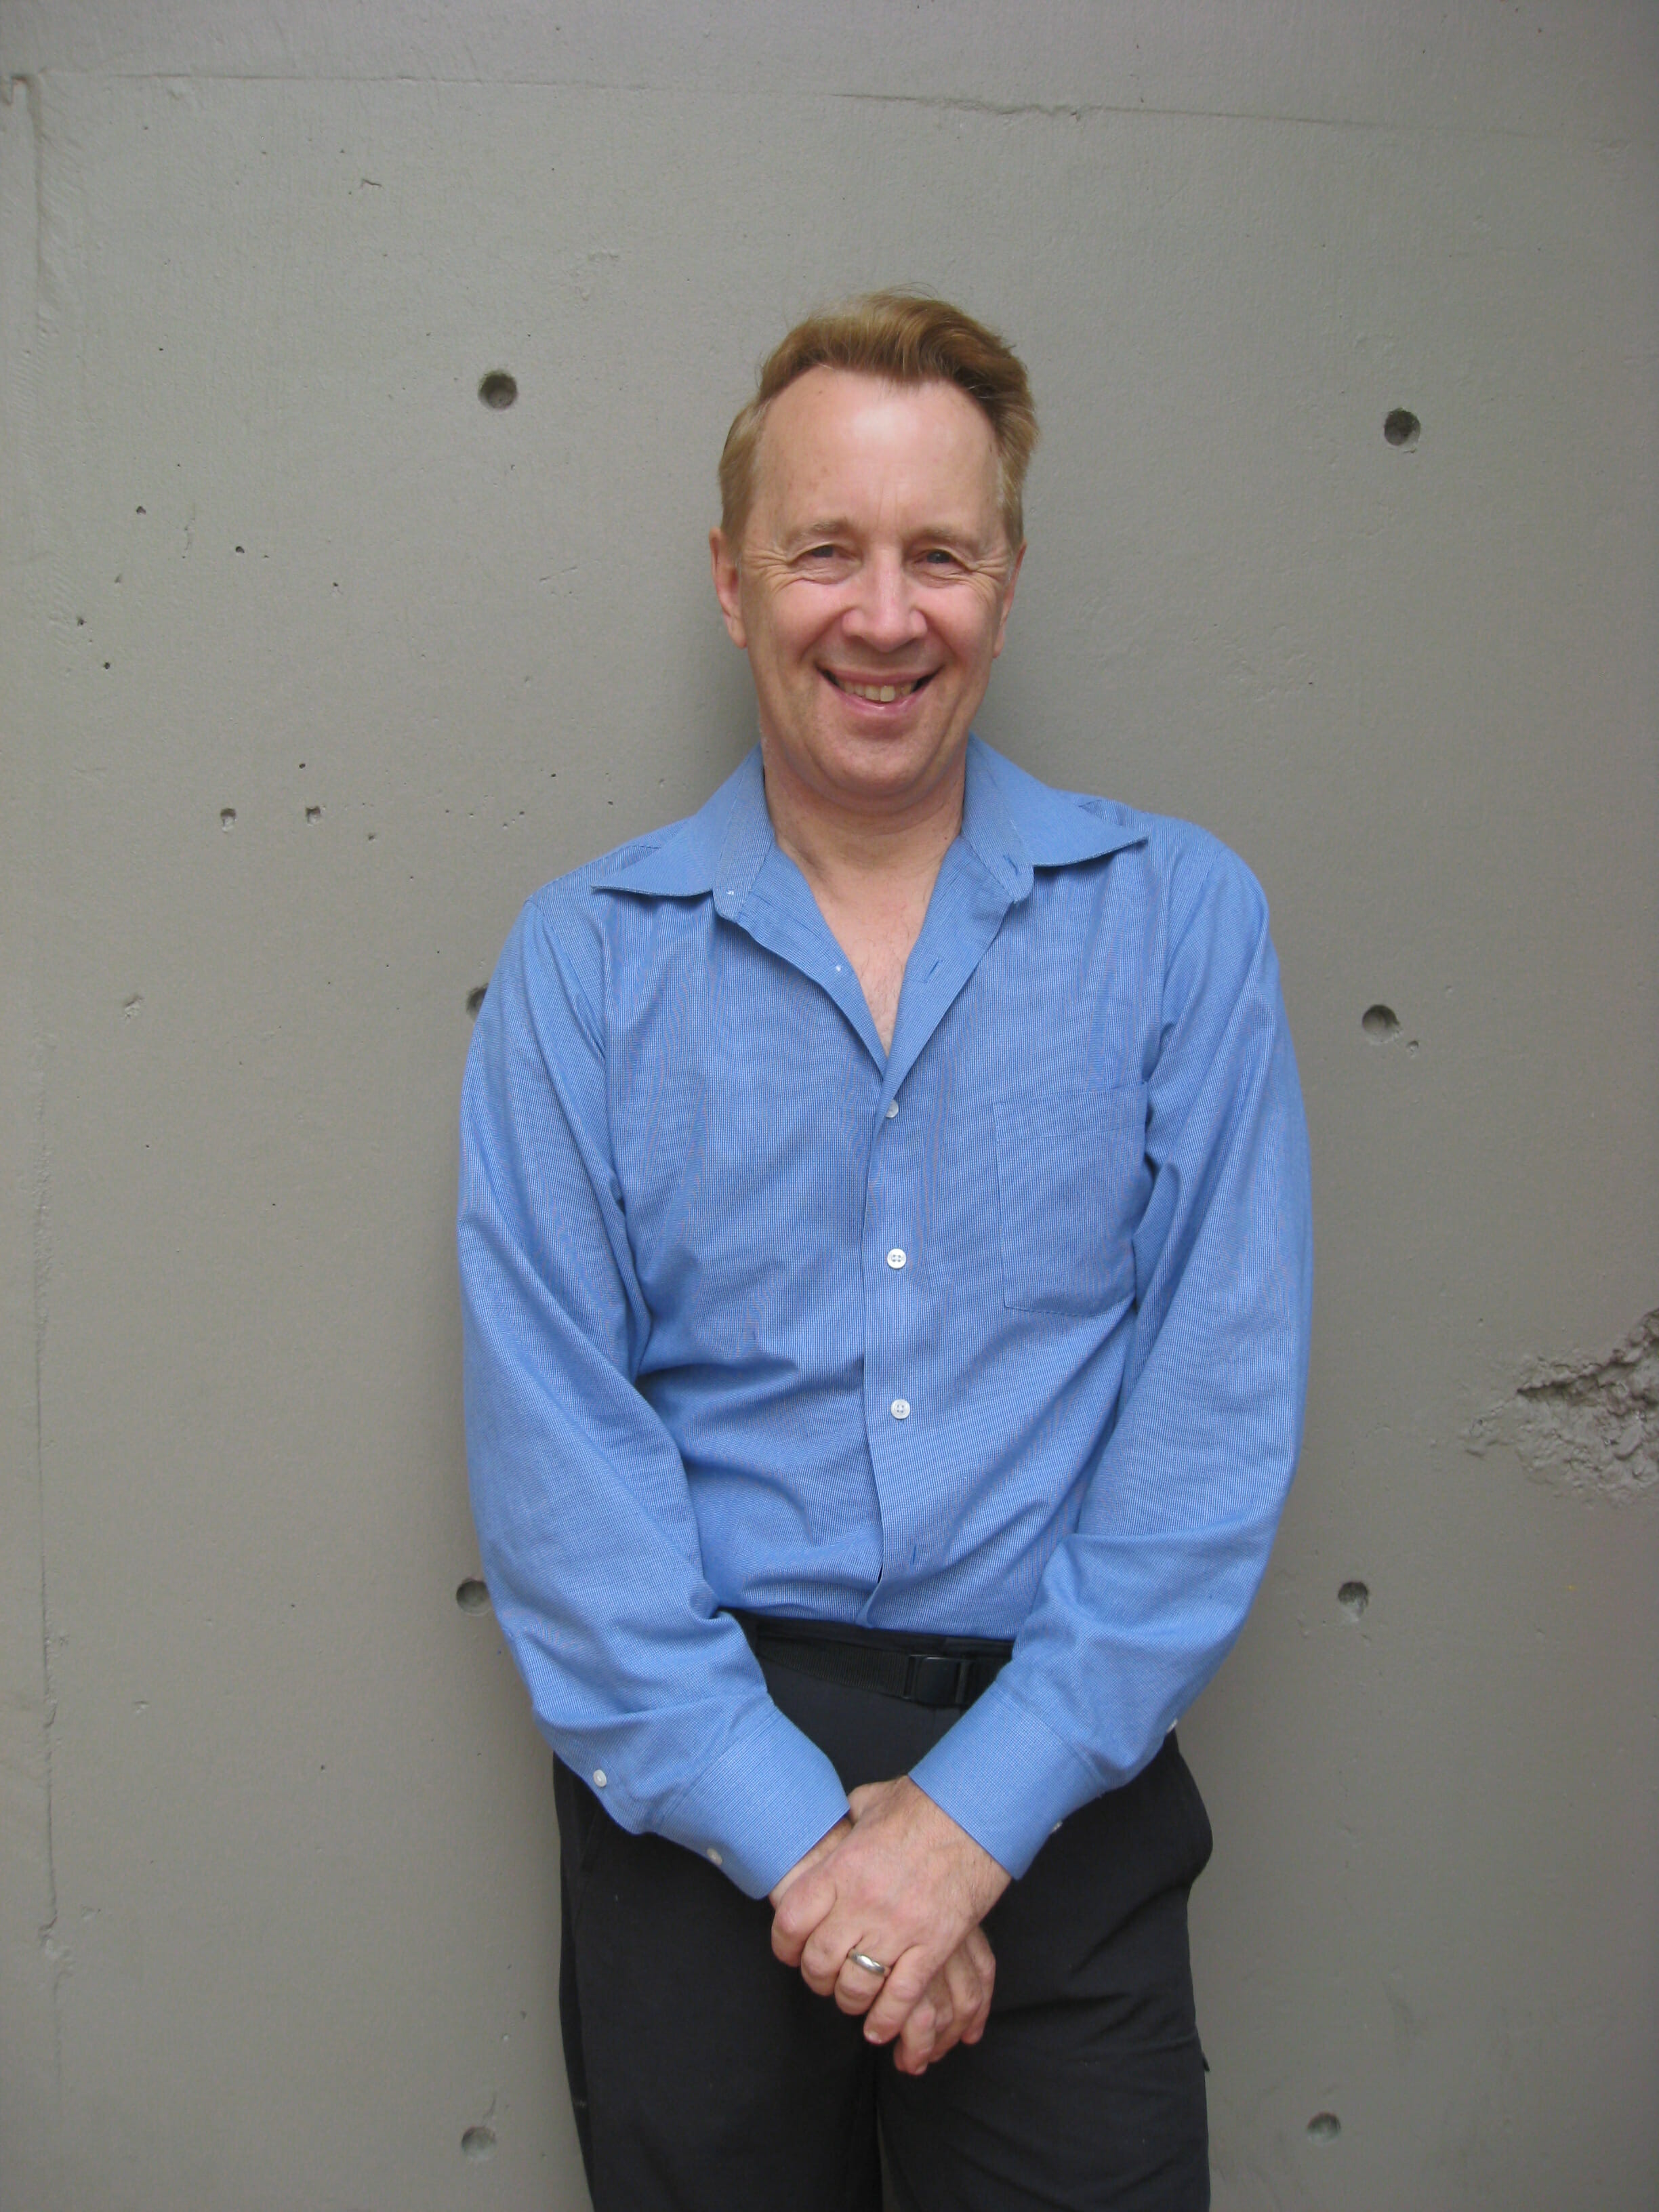 Alan Scofield, Dance Instructor